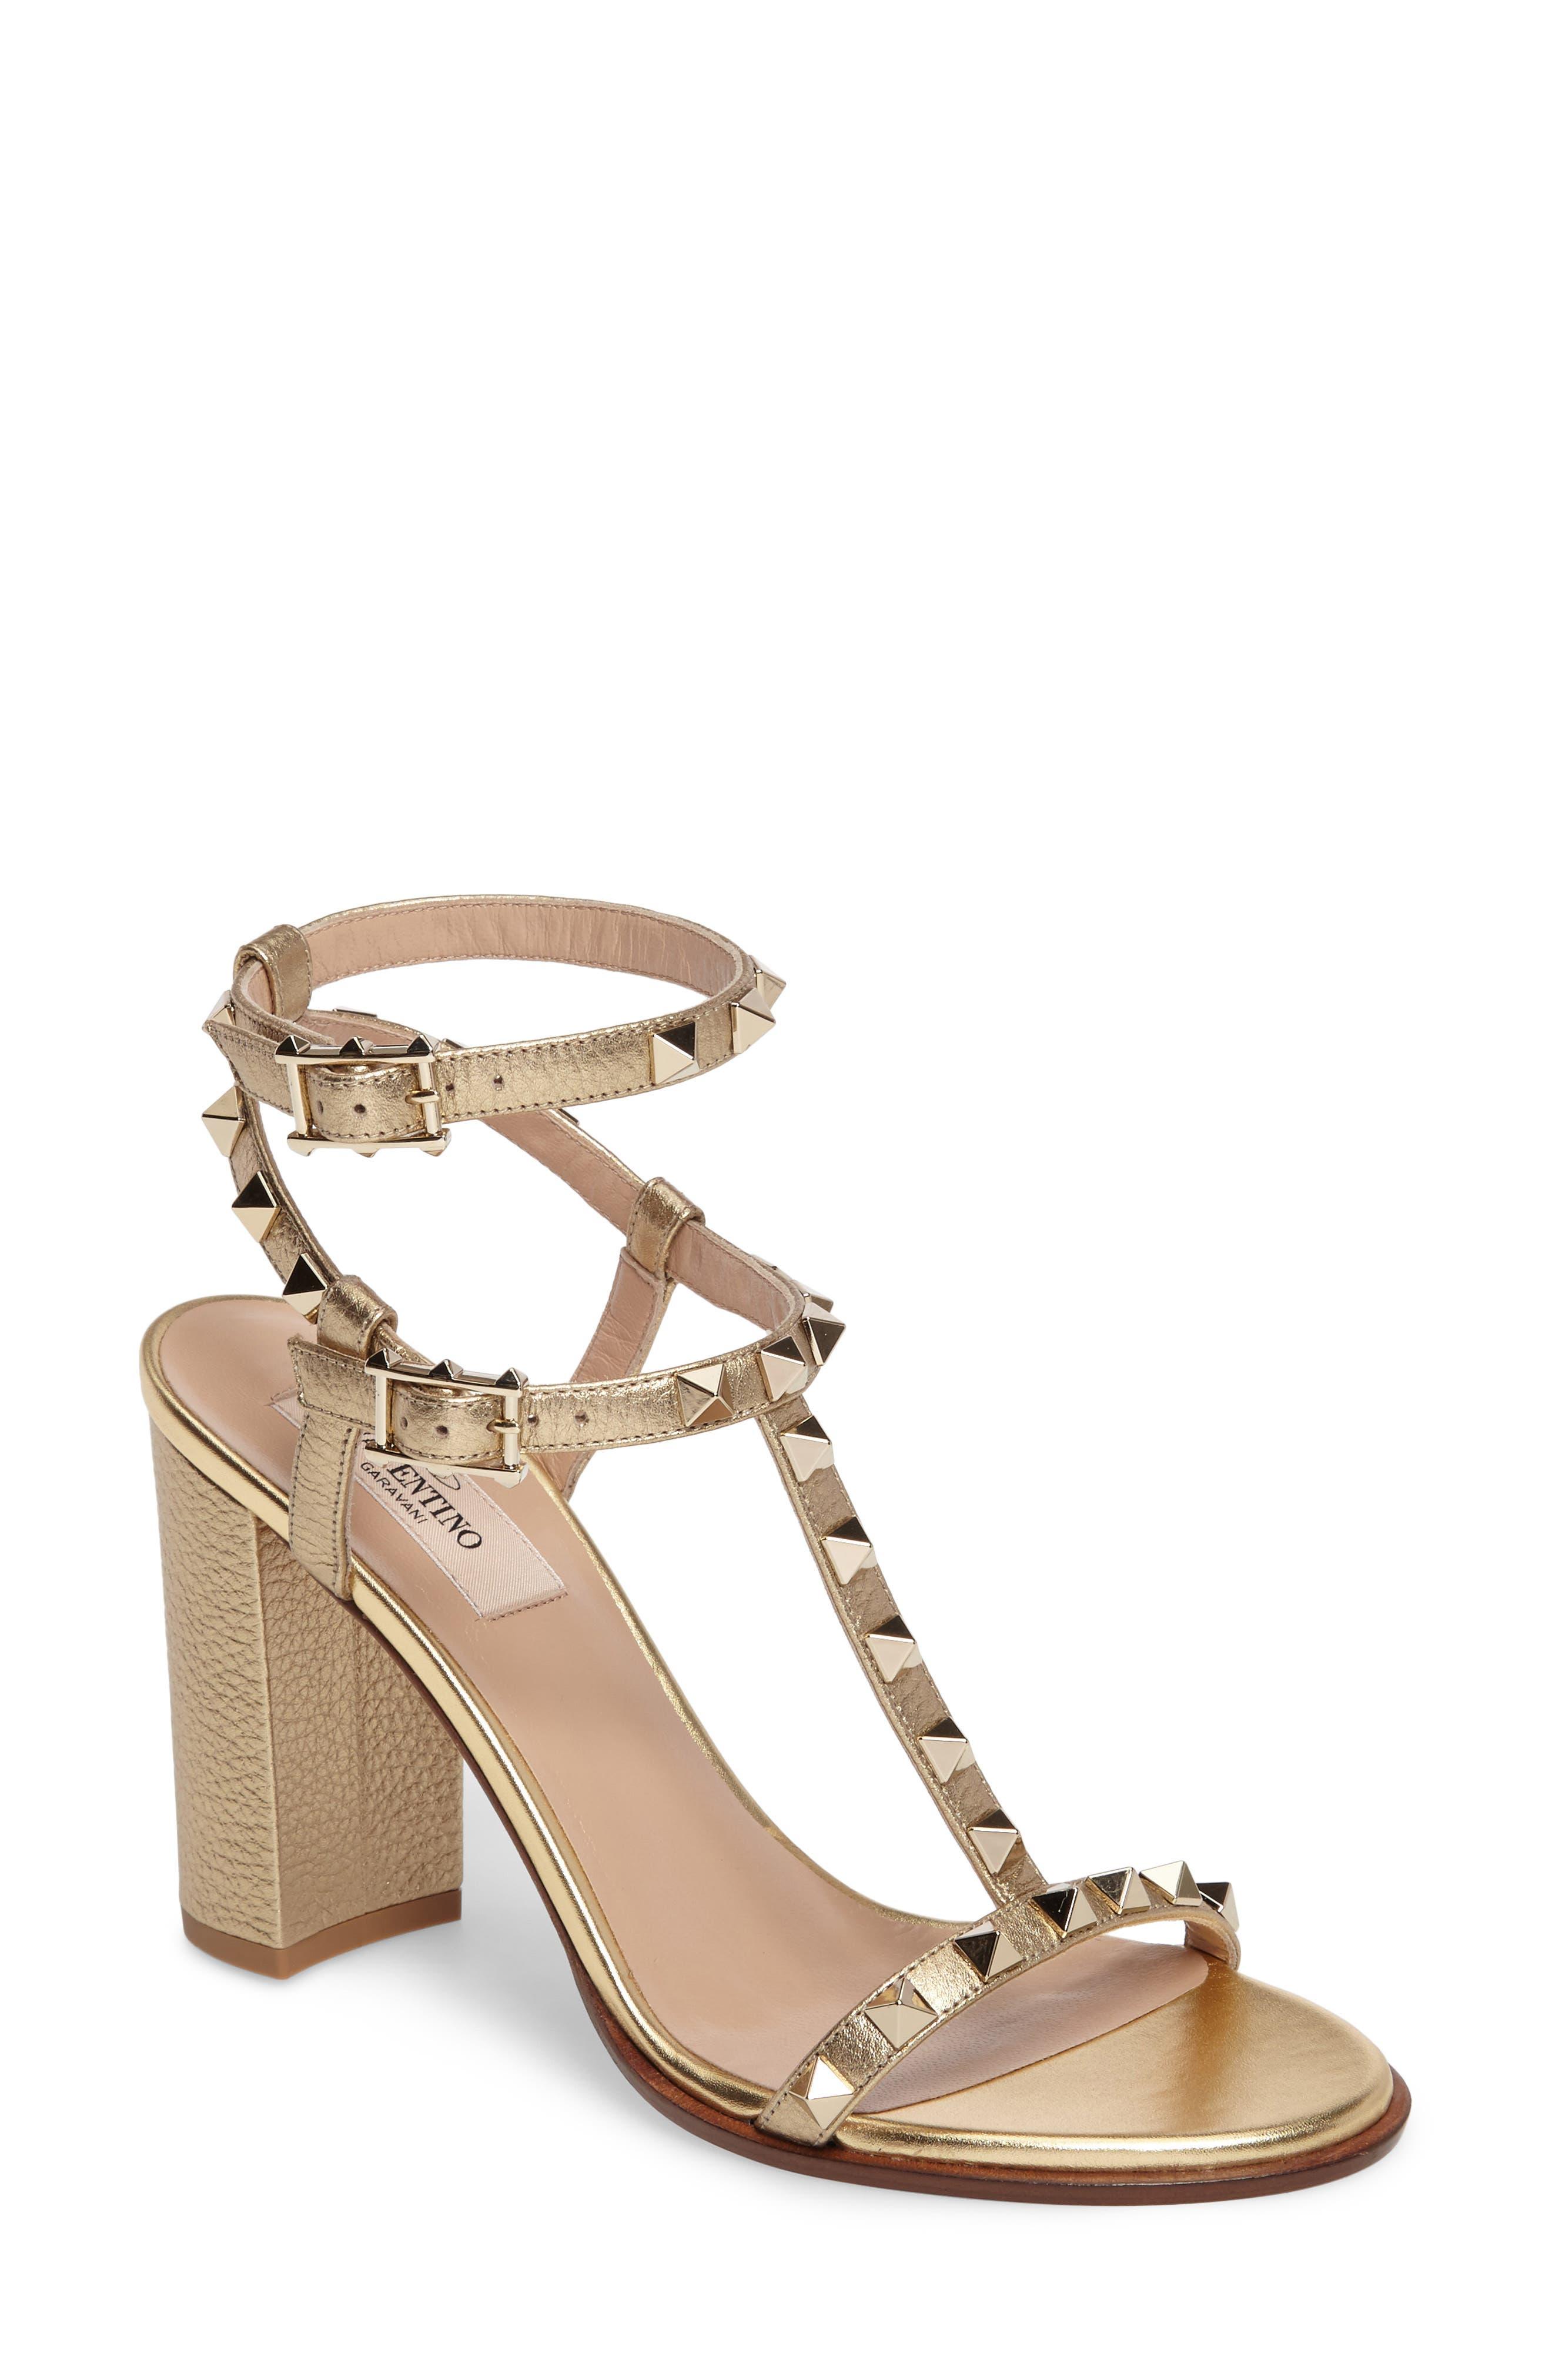 Alternate Image 1 Selected - VALENTINO GARAVANI Rockstud Ankle Strap Sandal (Women)